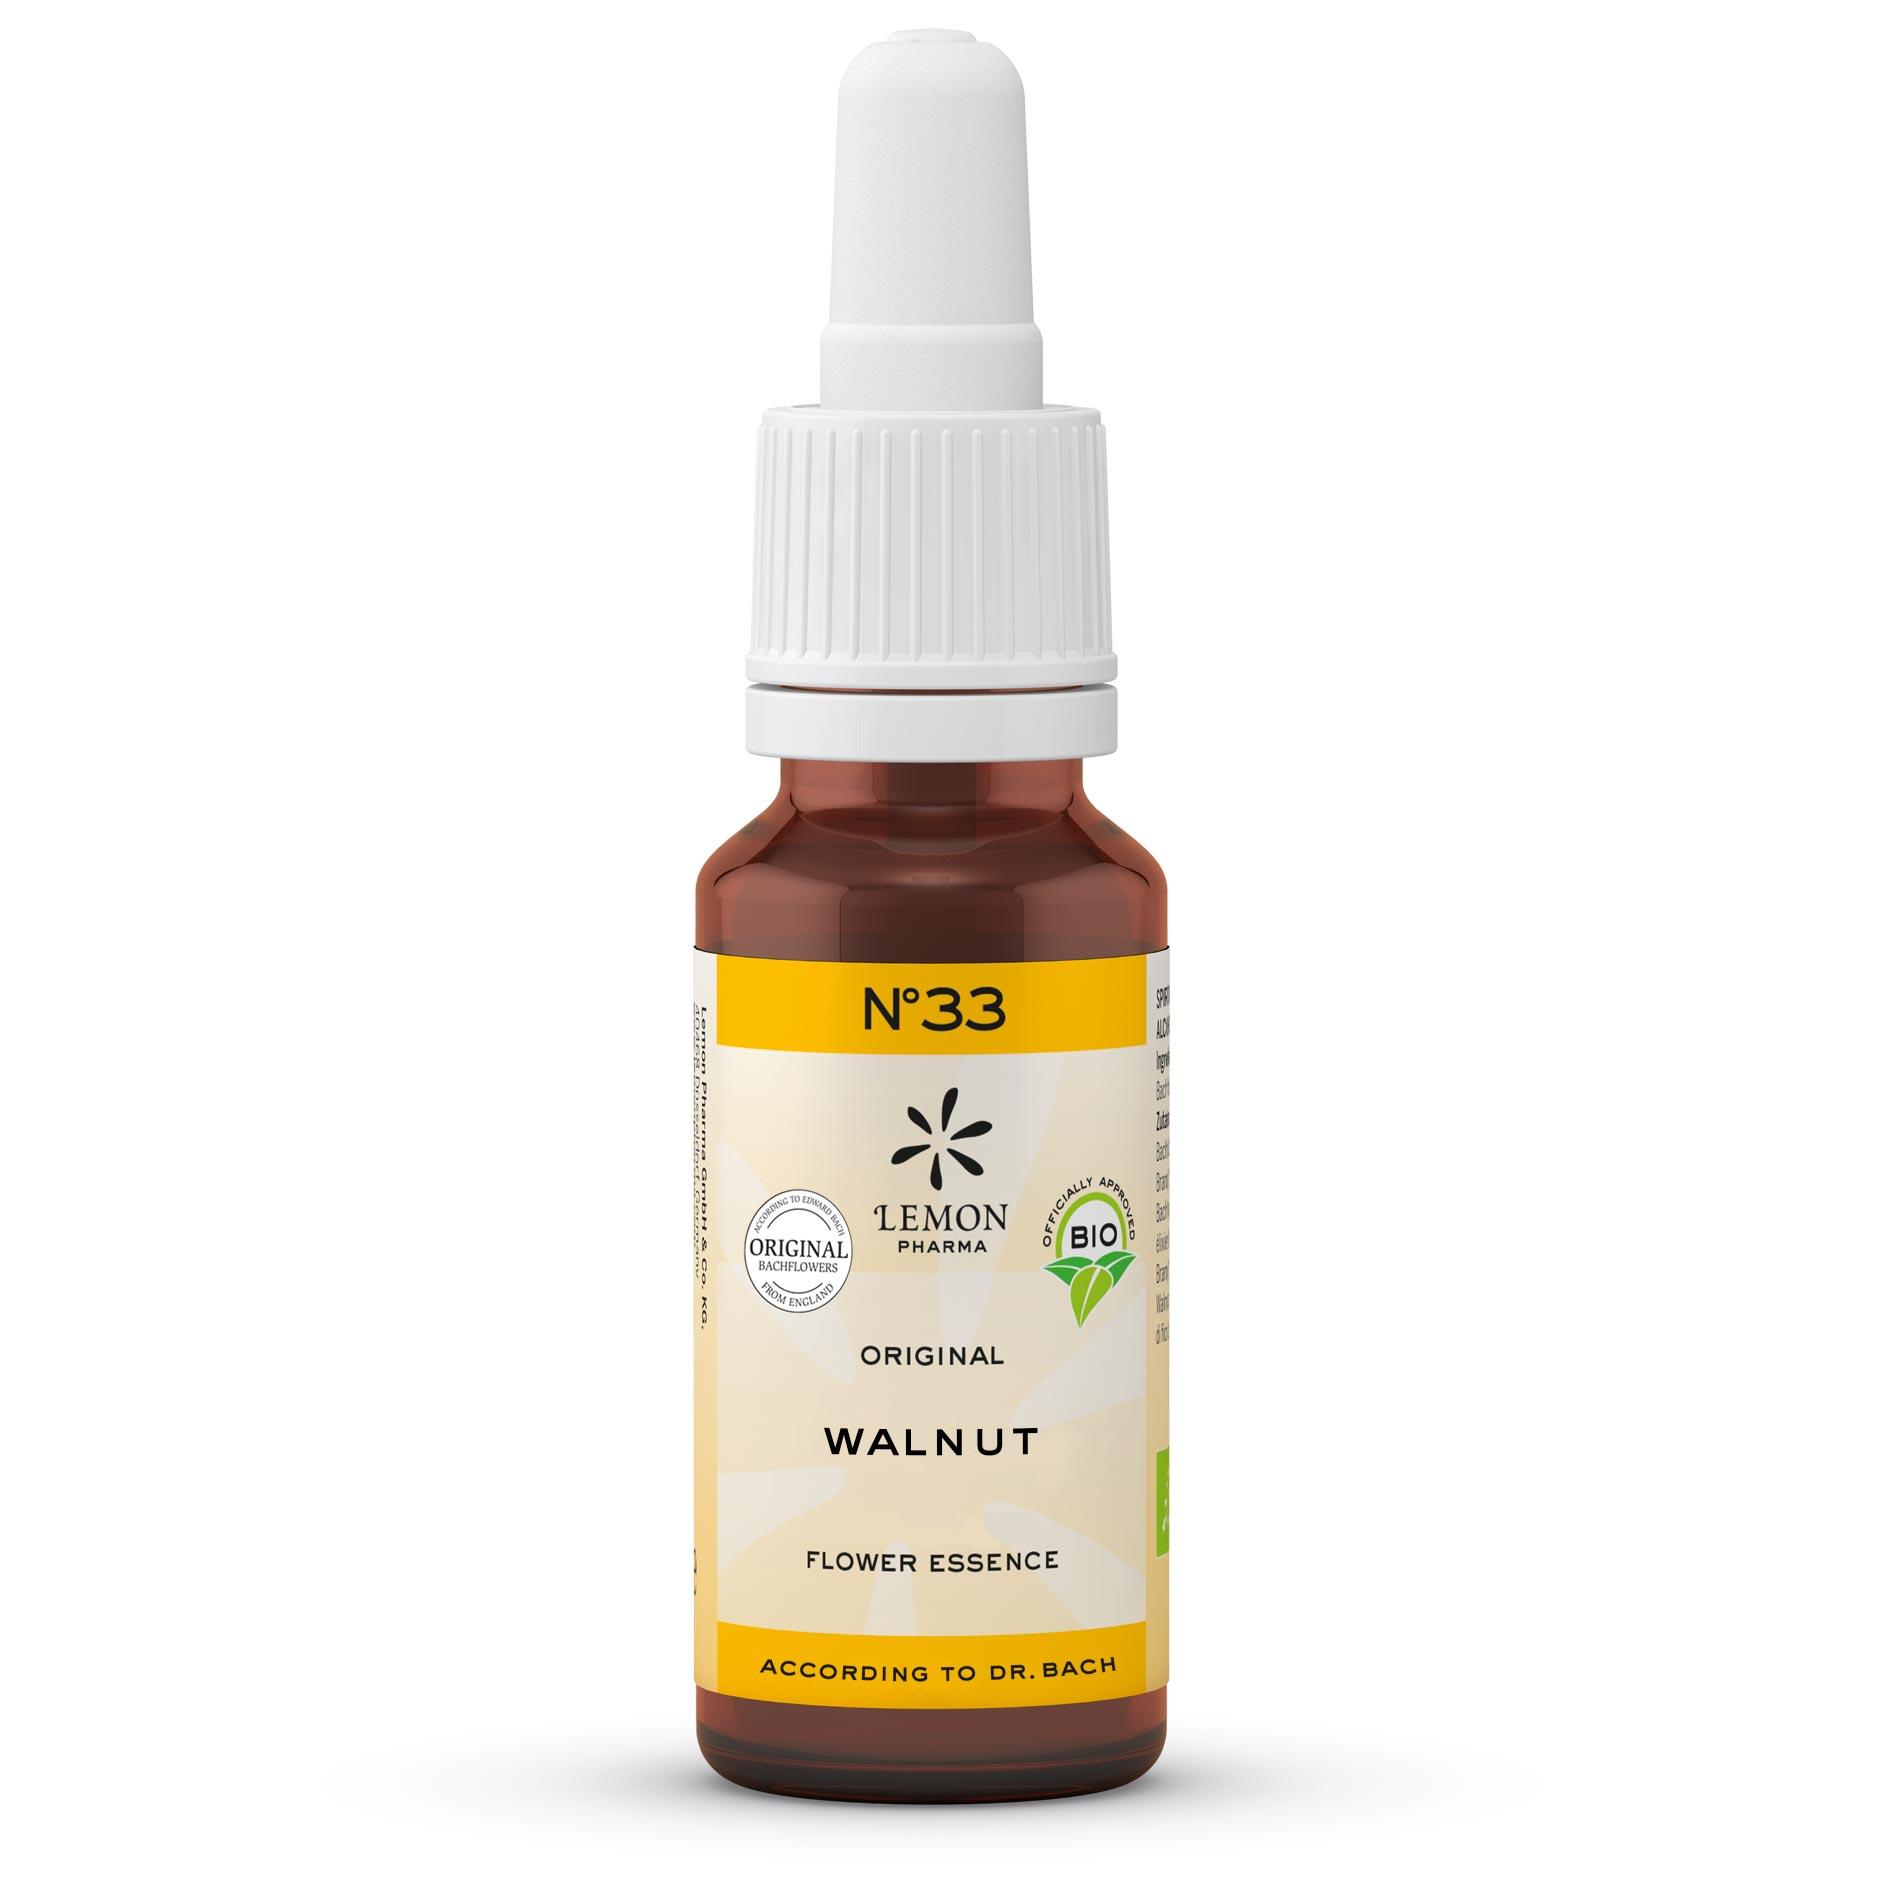 Lemon Pharma Gouttes Fleurs de Bach Original n°33 Walnut Noyer Renaissance